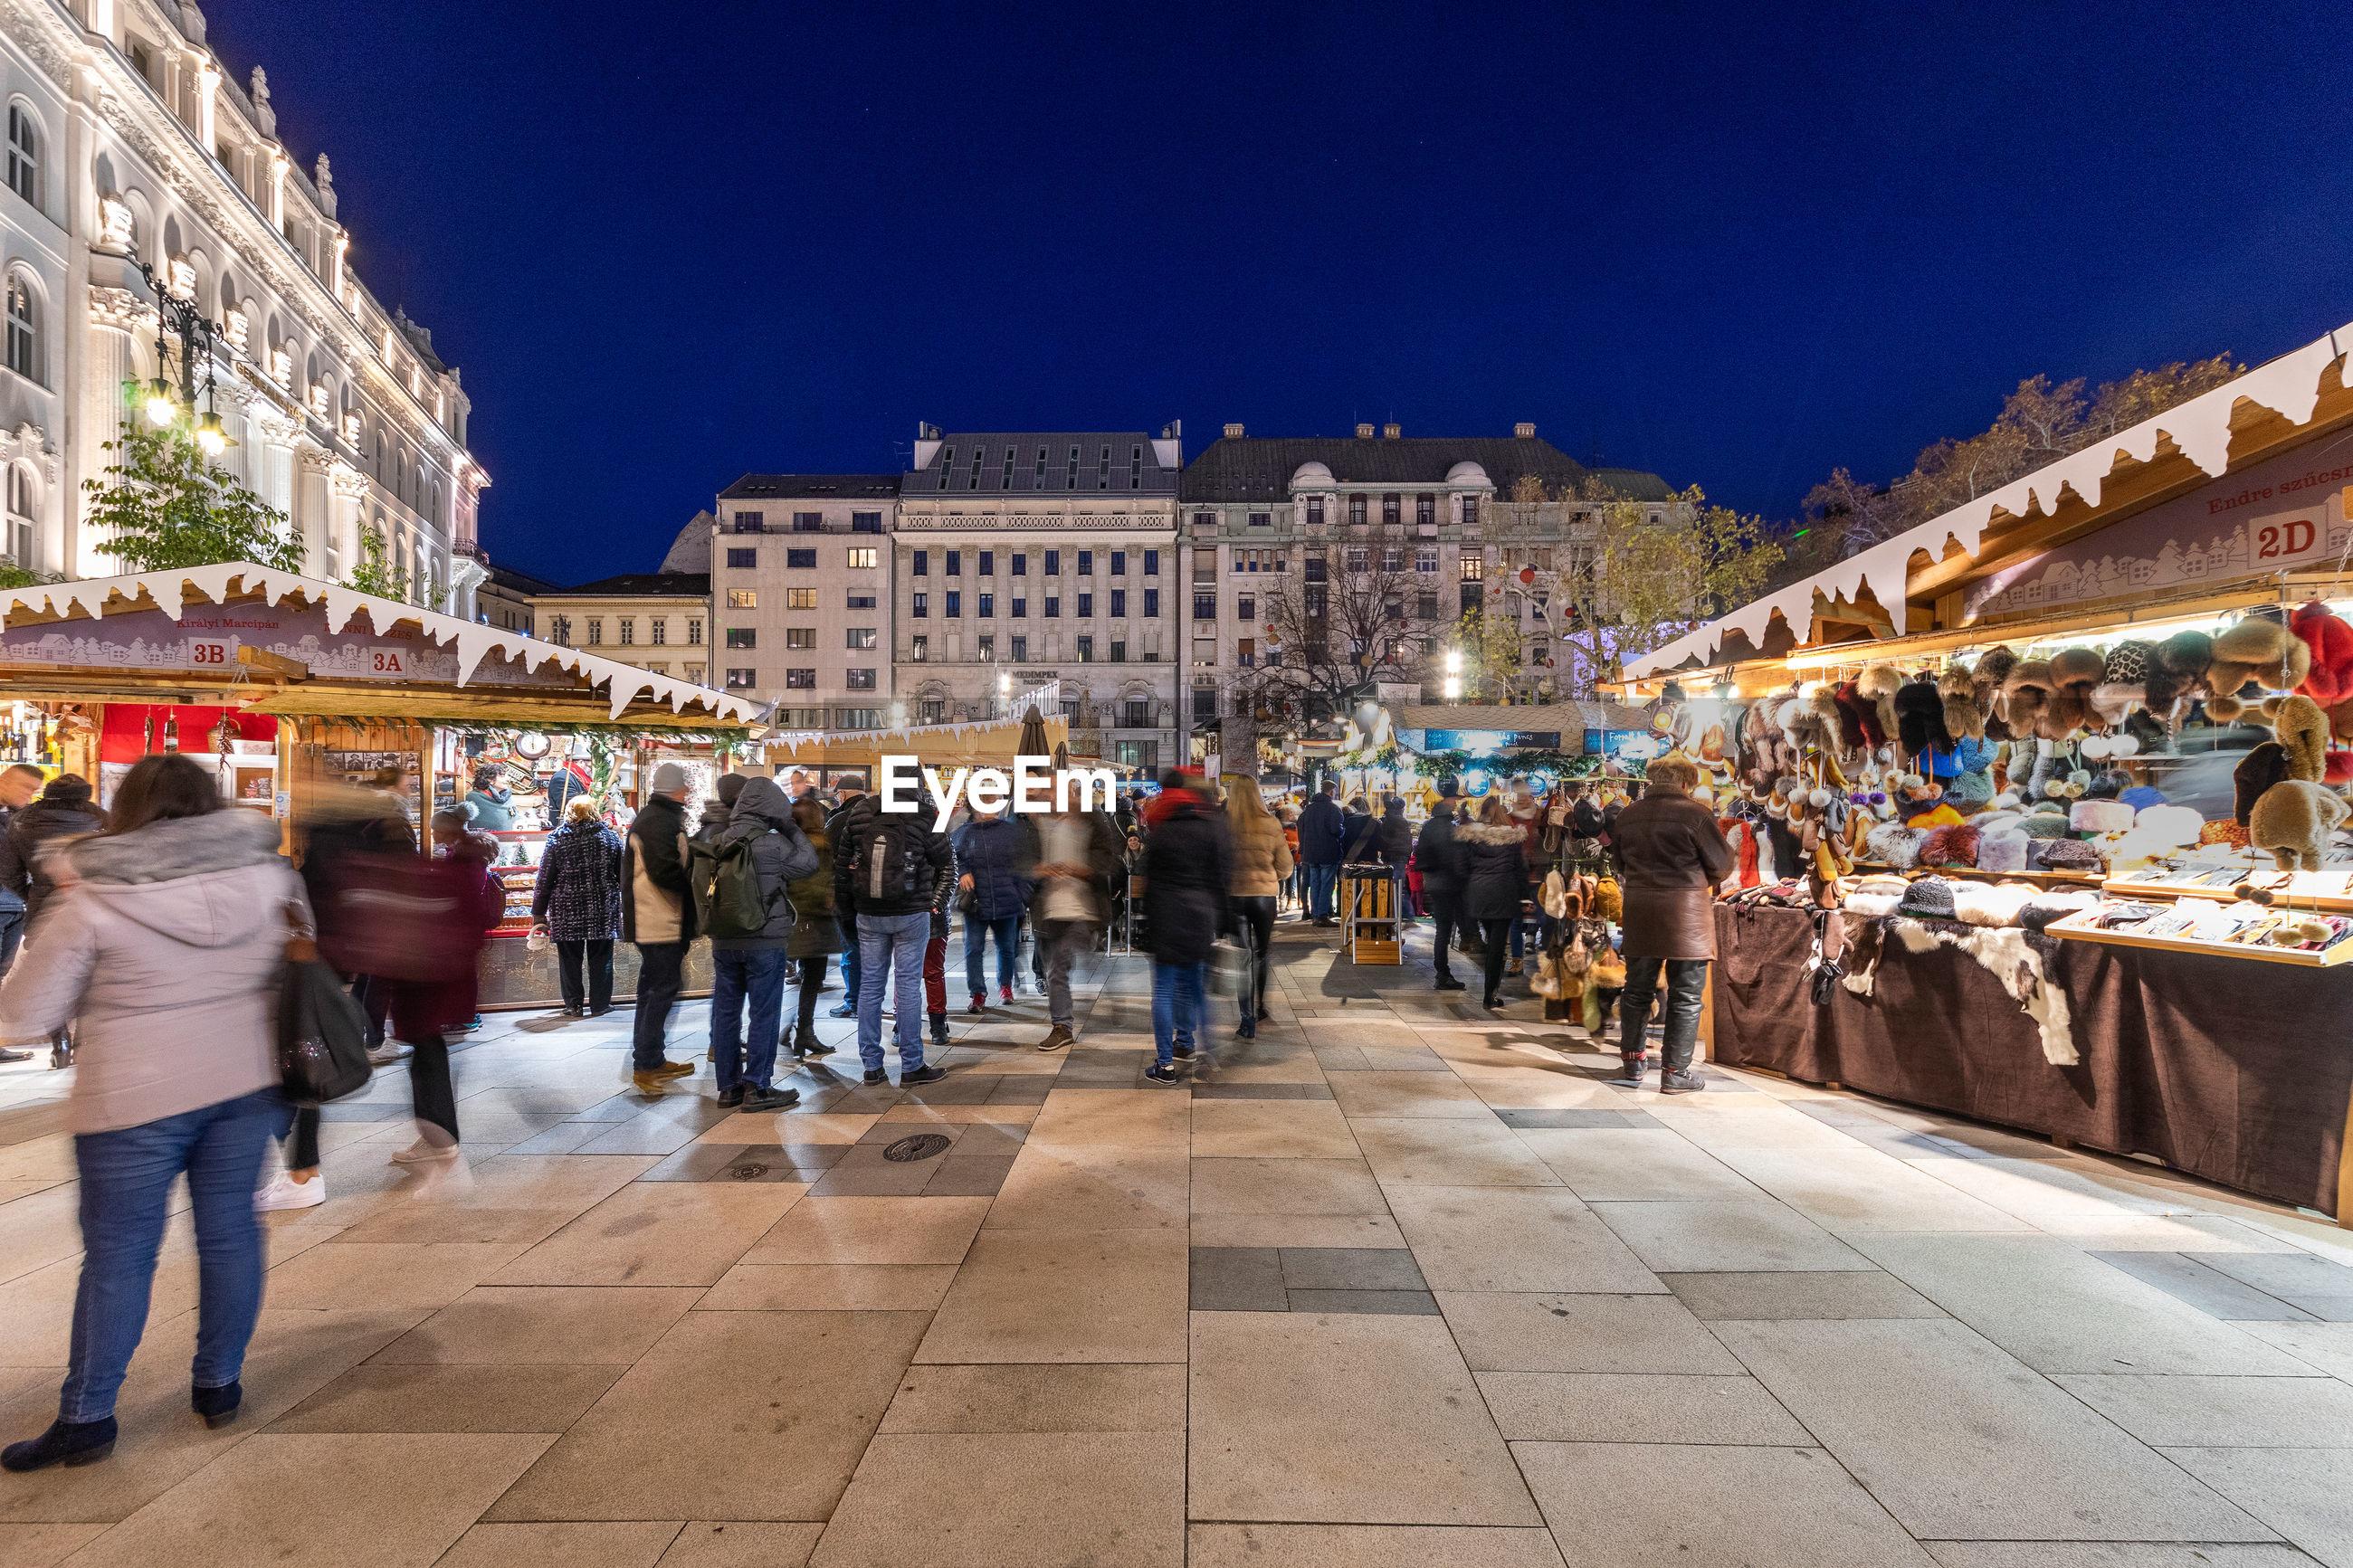 GROUP OF PEOPLE WALKING ON ILLUMINATED CITY AT NIGHT